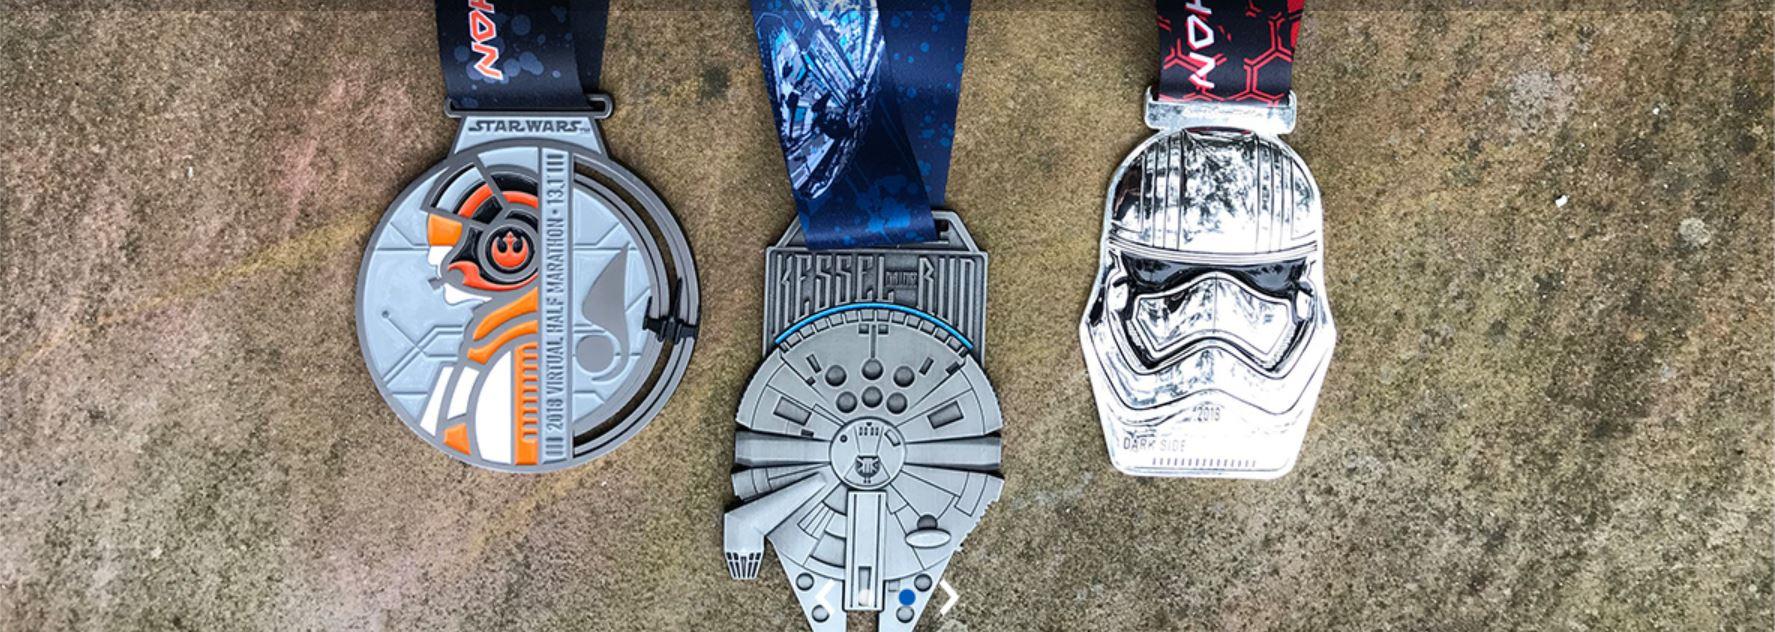 runDisney Star Wars Virtual Half Marathon